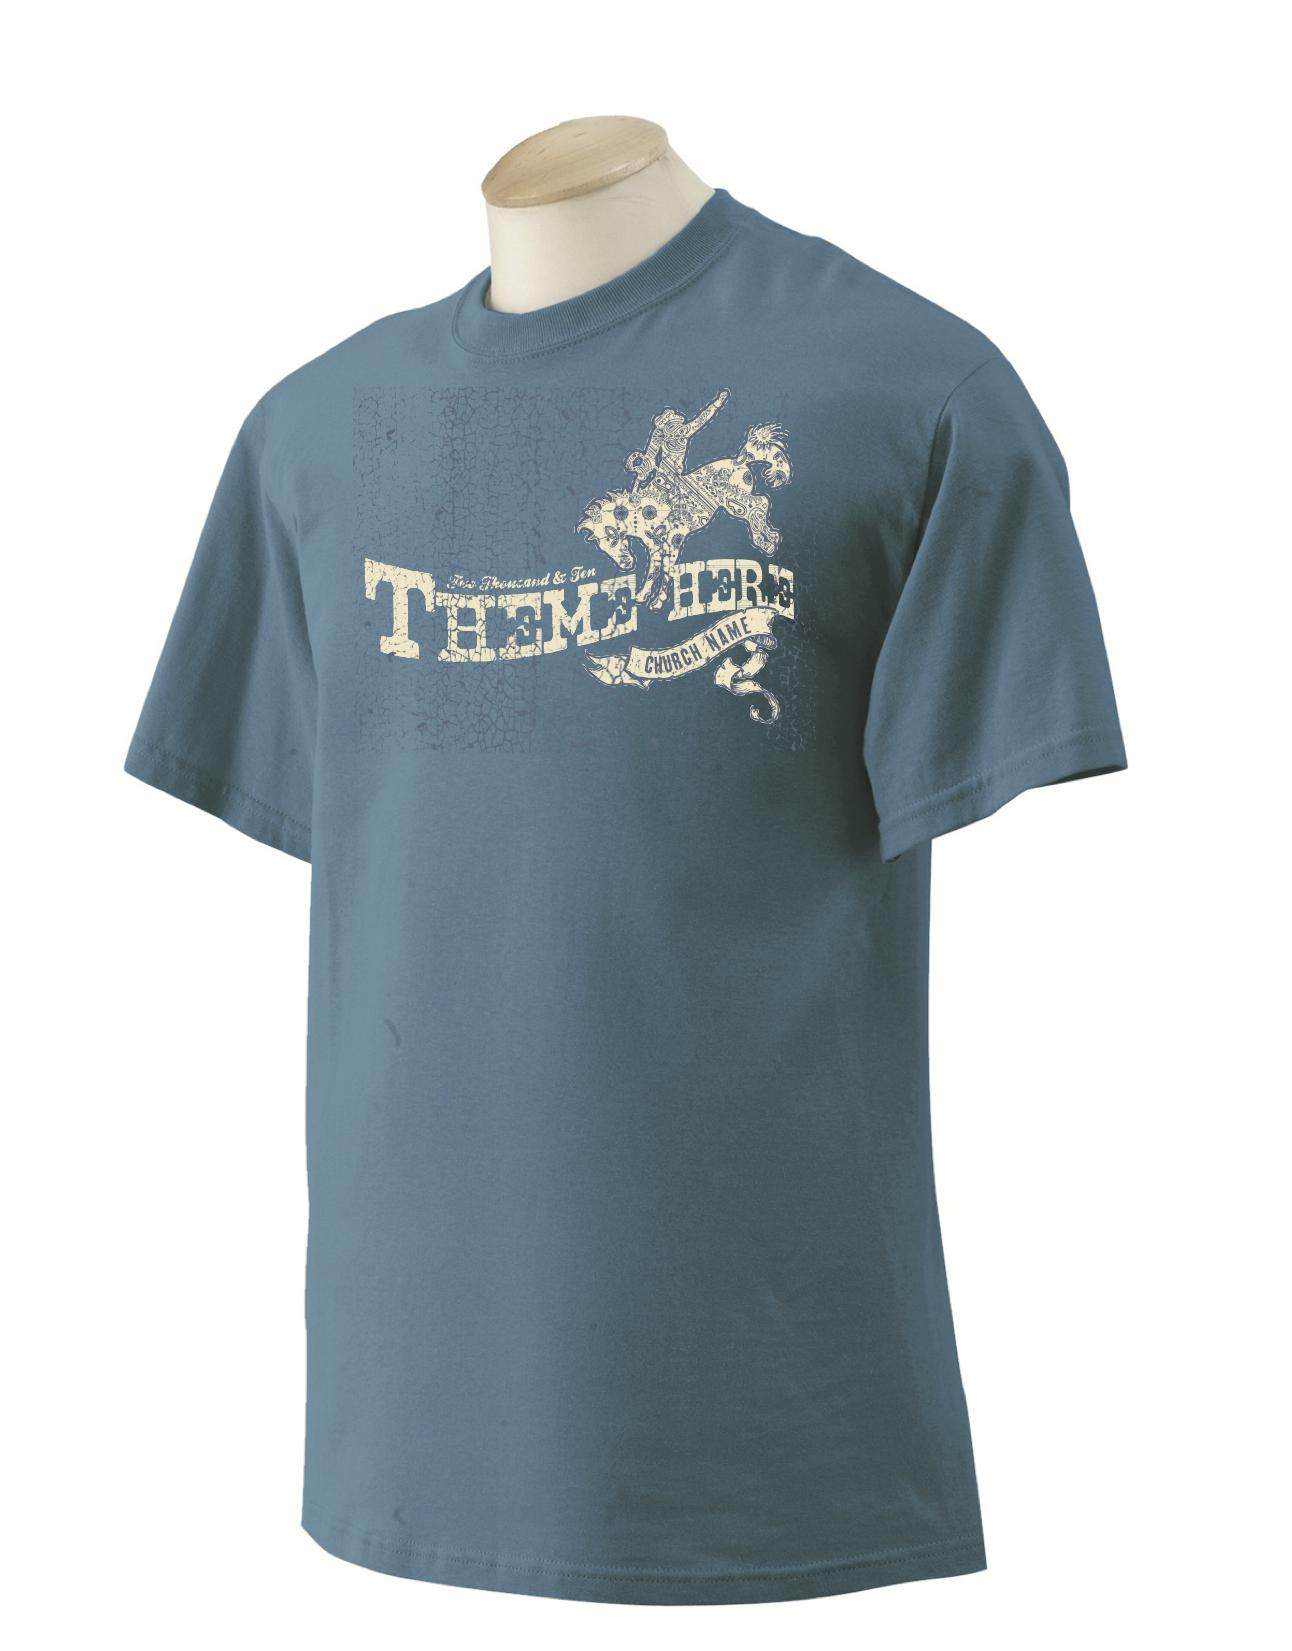 ranch 1 indigo blue shirt.jpg